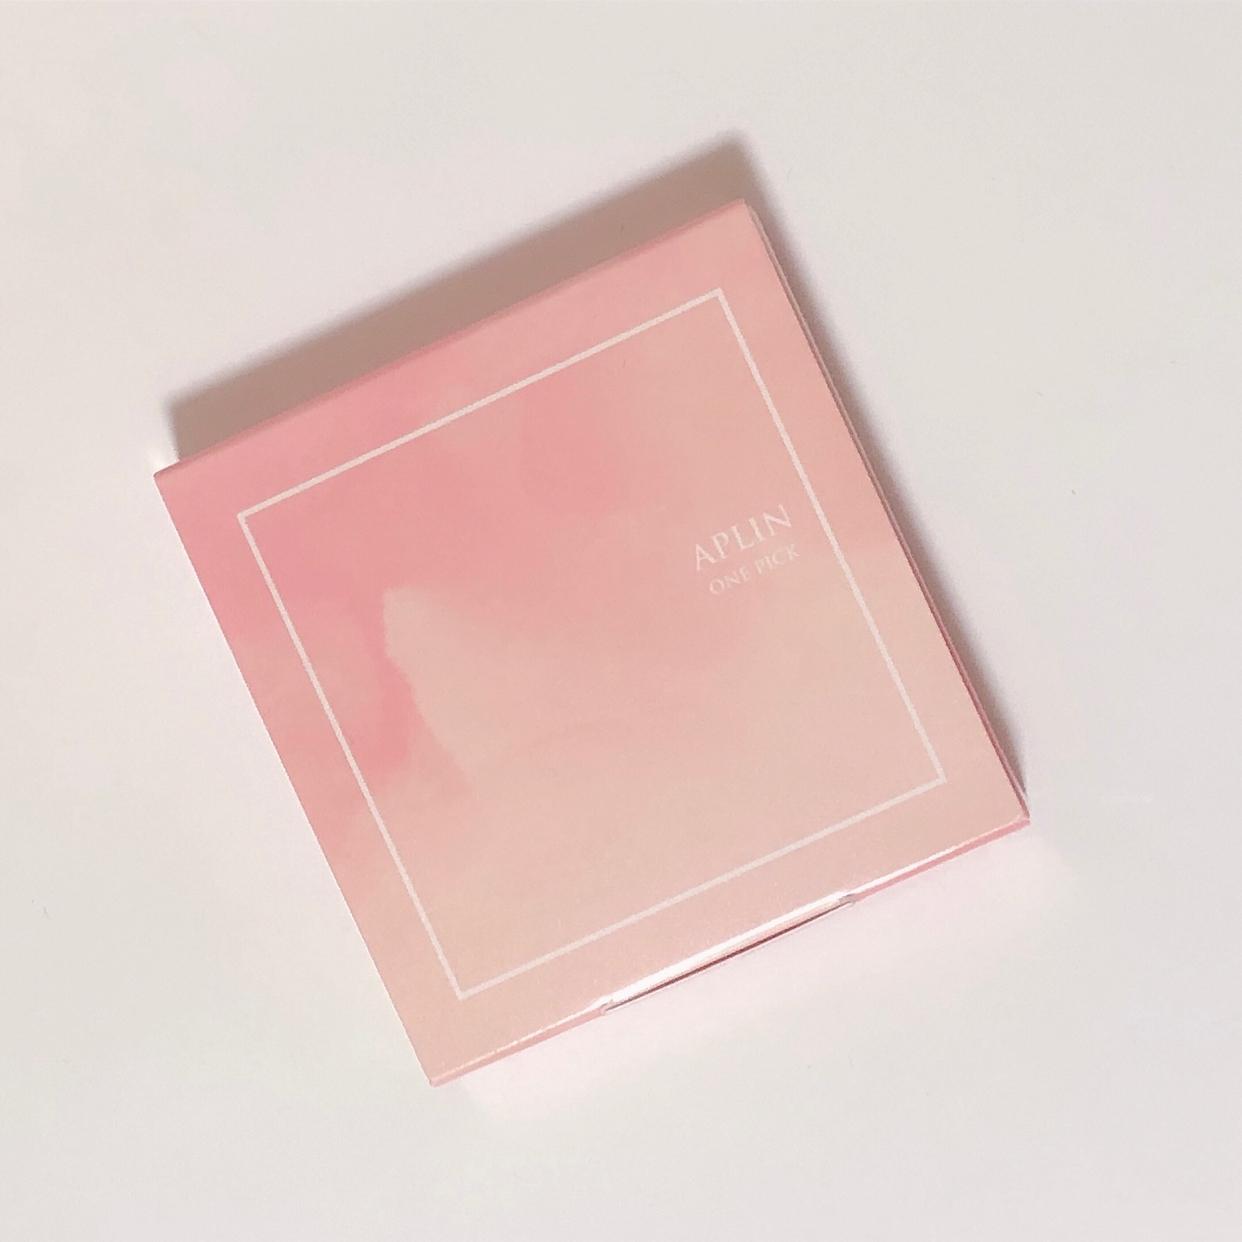 APLIN(アプリン) ワンピックアイシャドウパレットを使った桜羽さんのクチコミ画像1